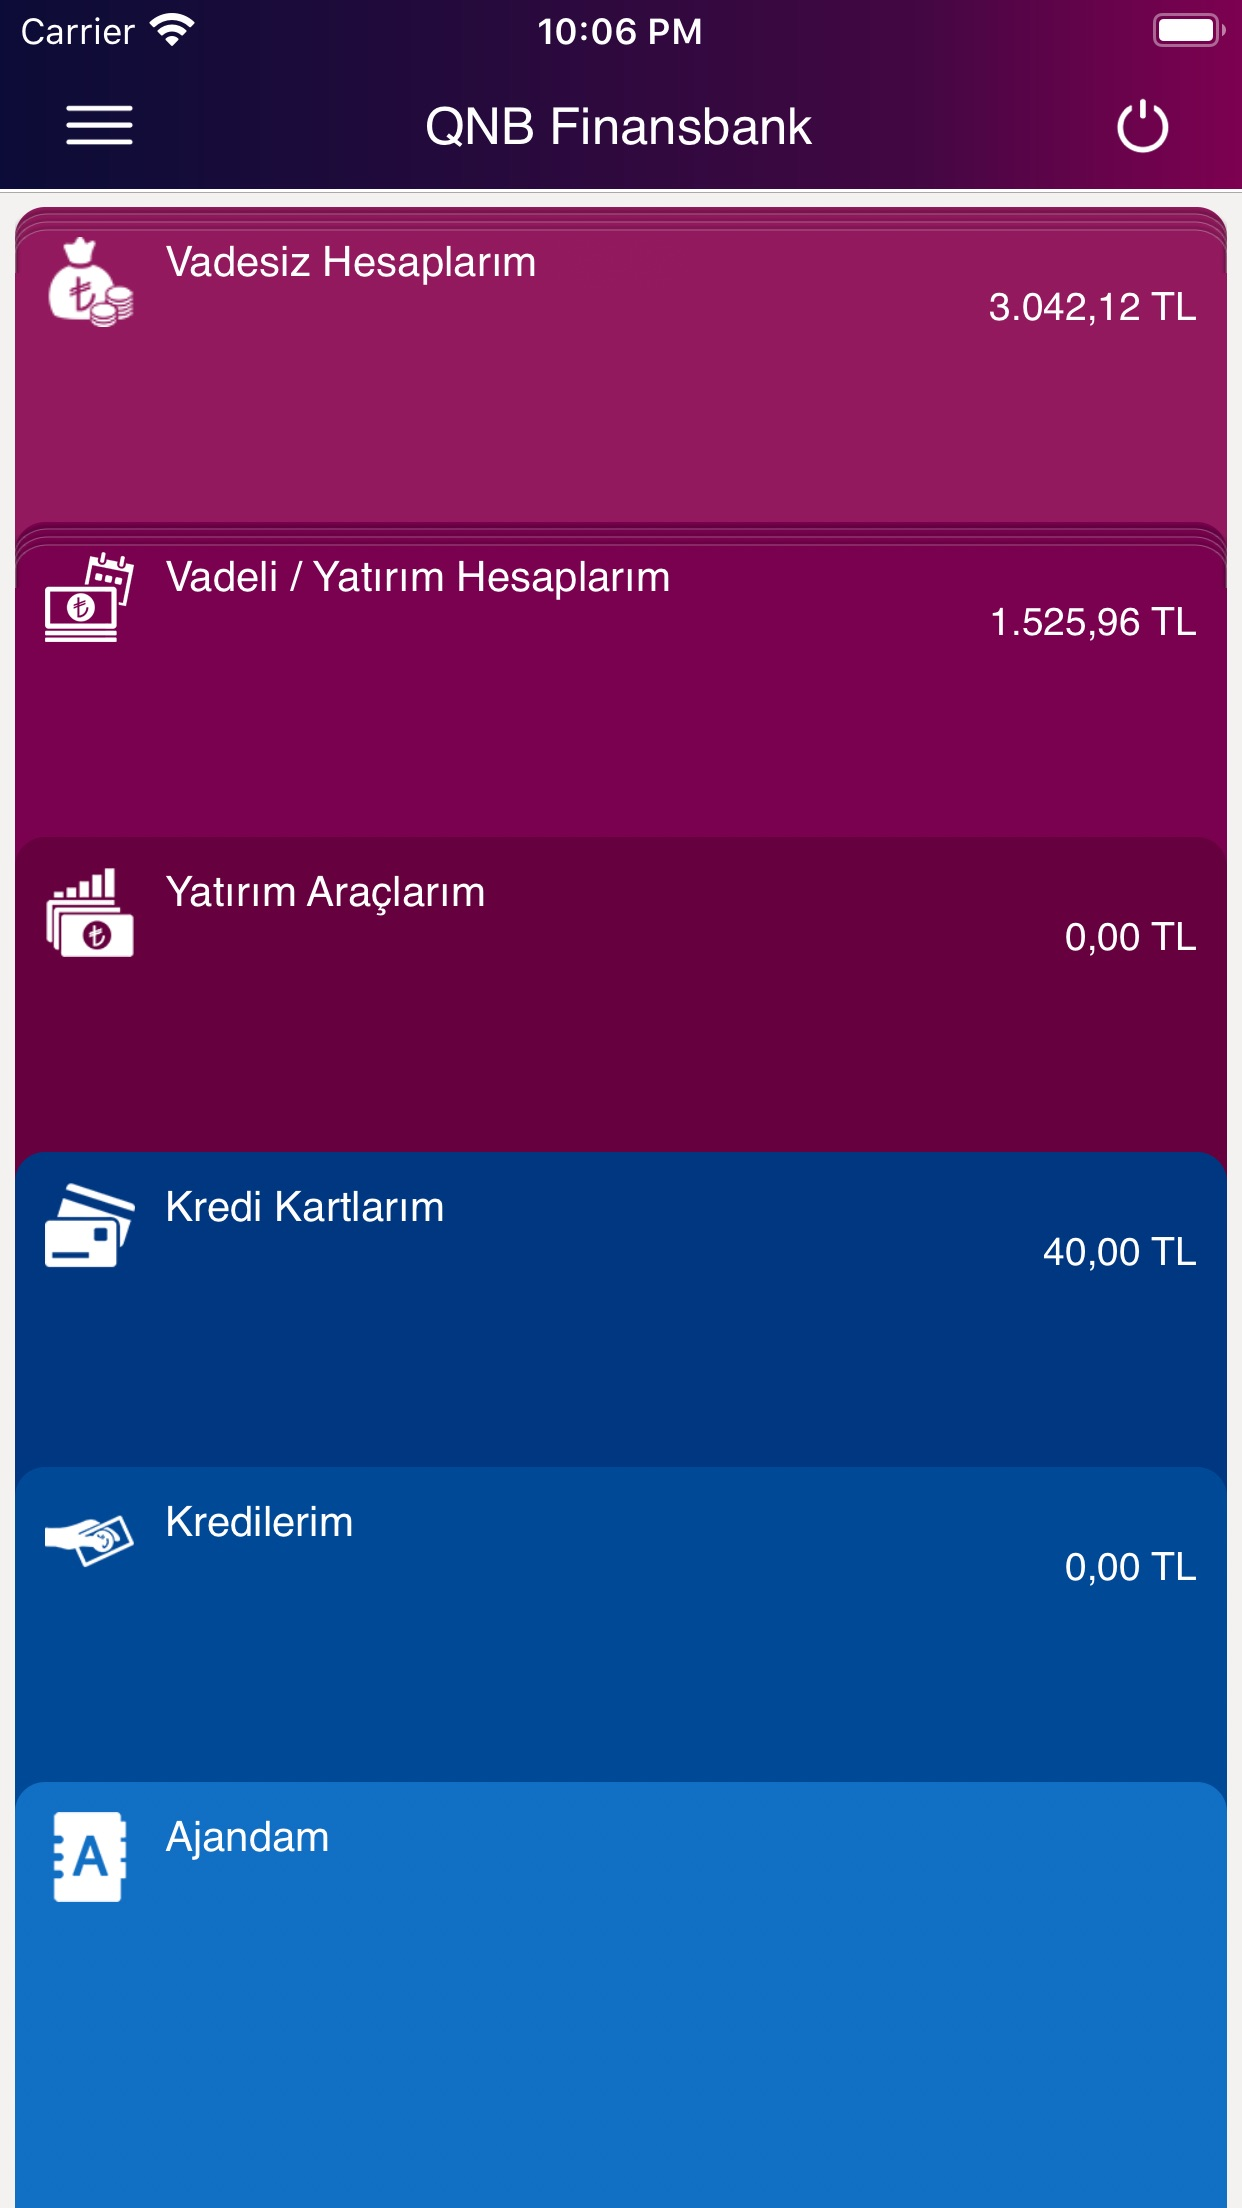 QNB Finansbank Mobile Banking Screenshot